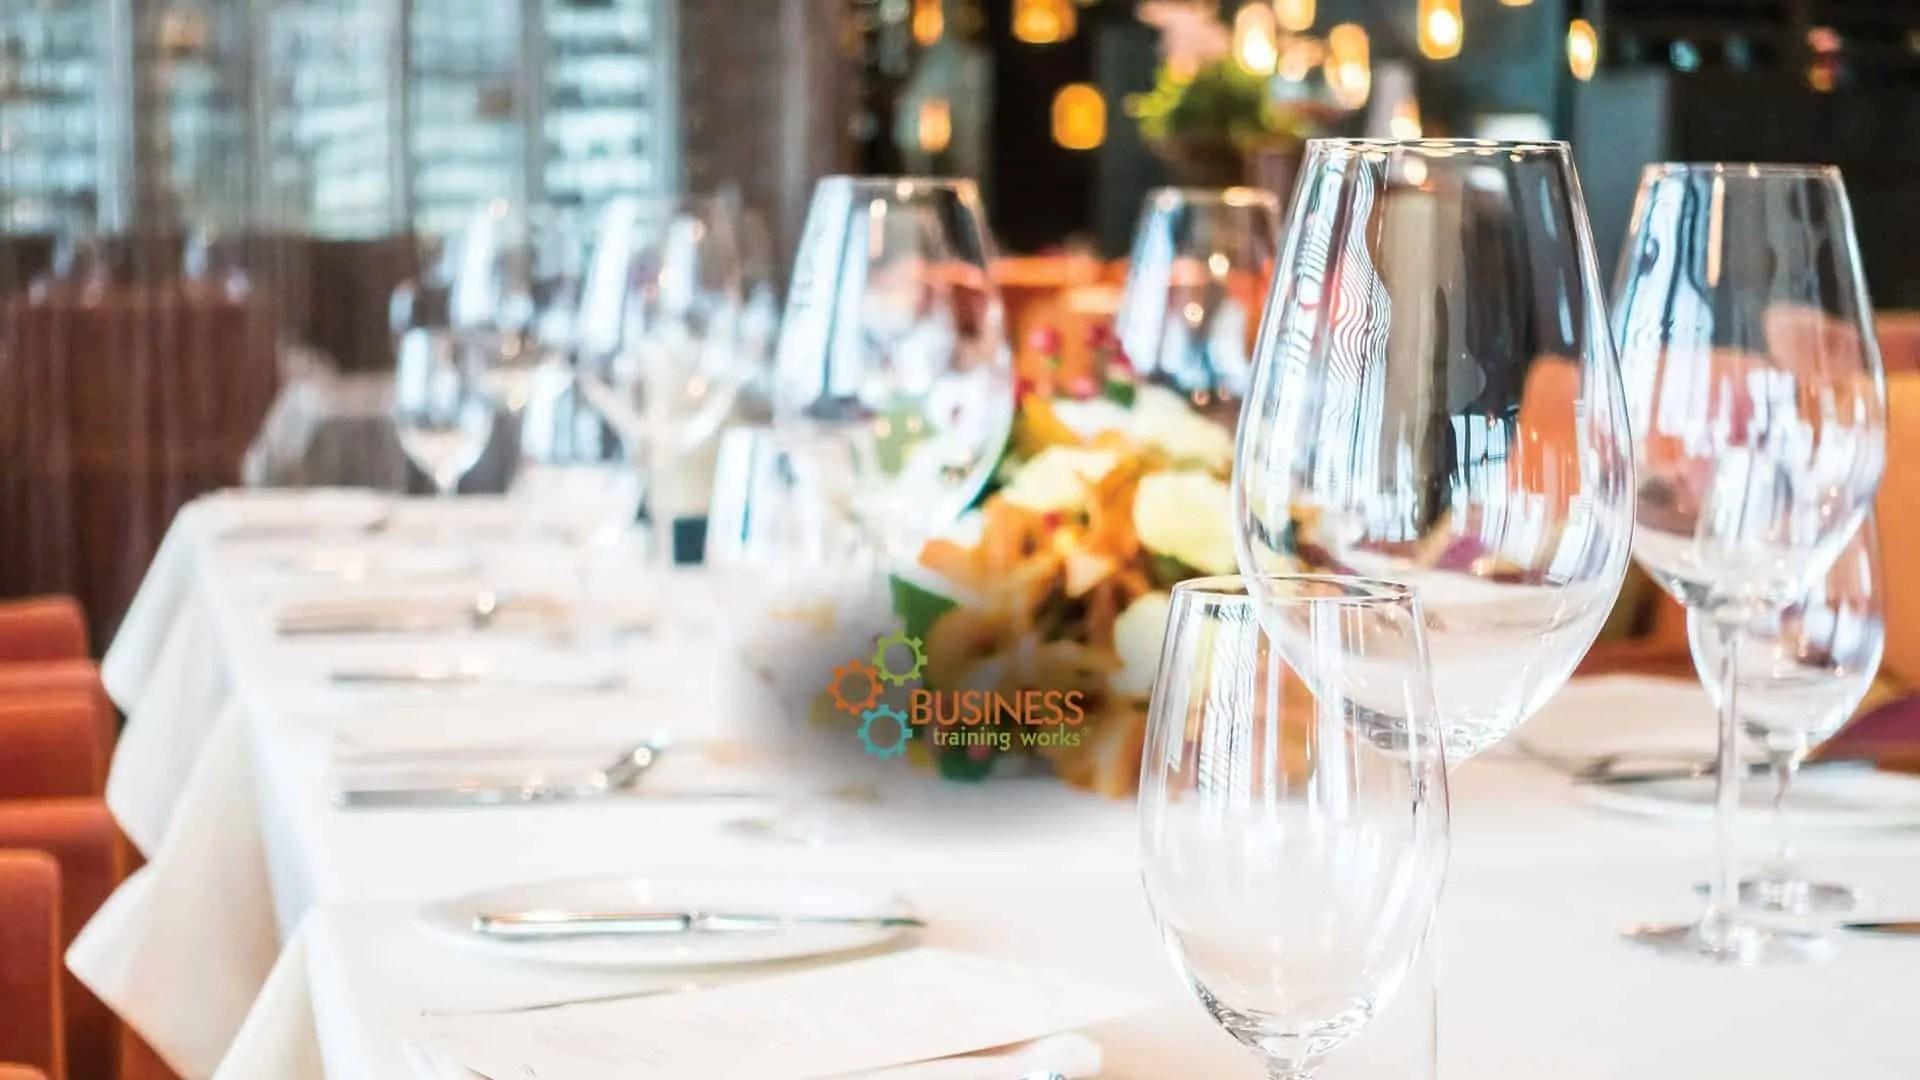 Business Etiquette Courses and Workshops